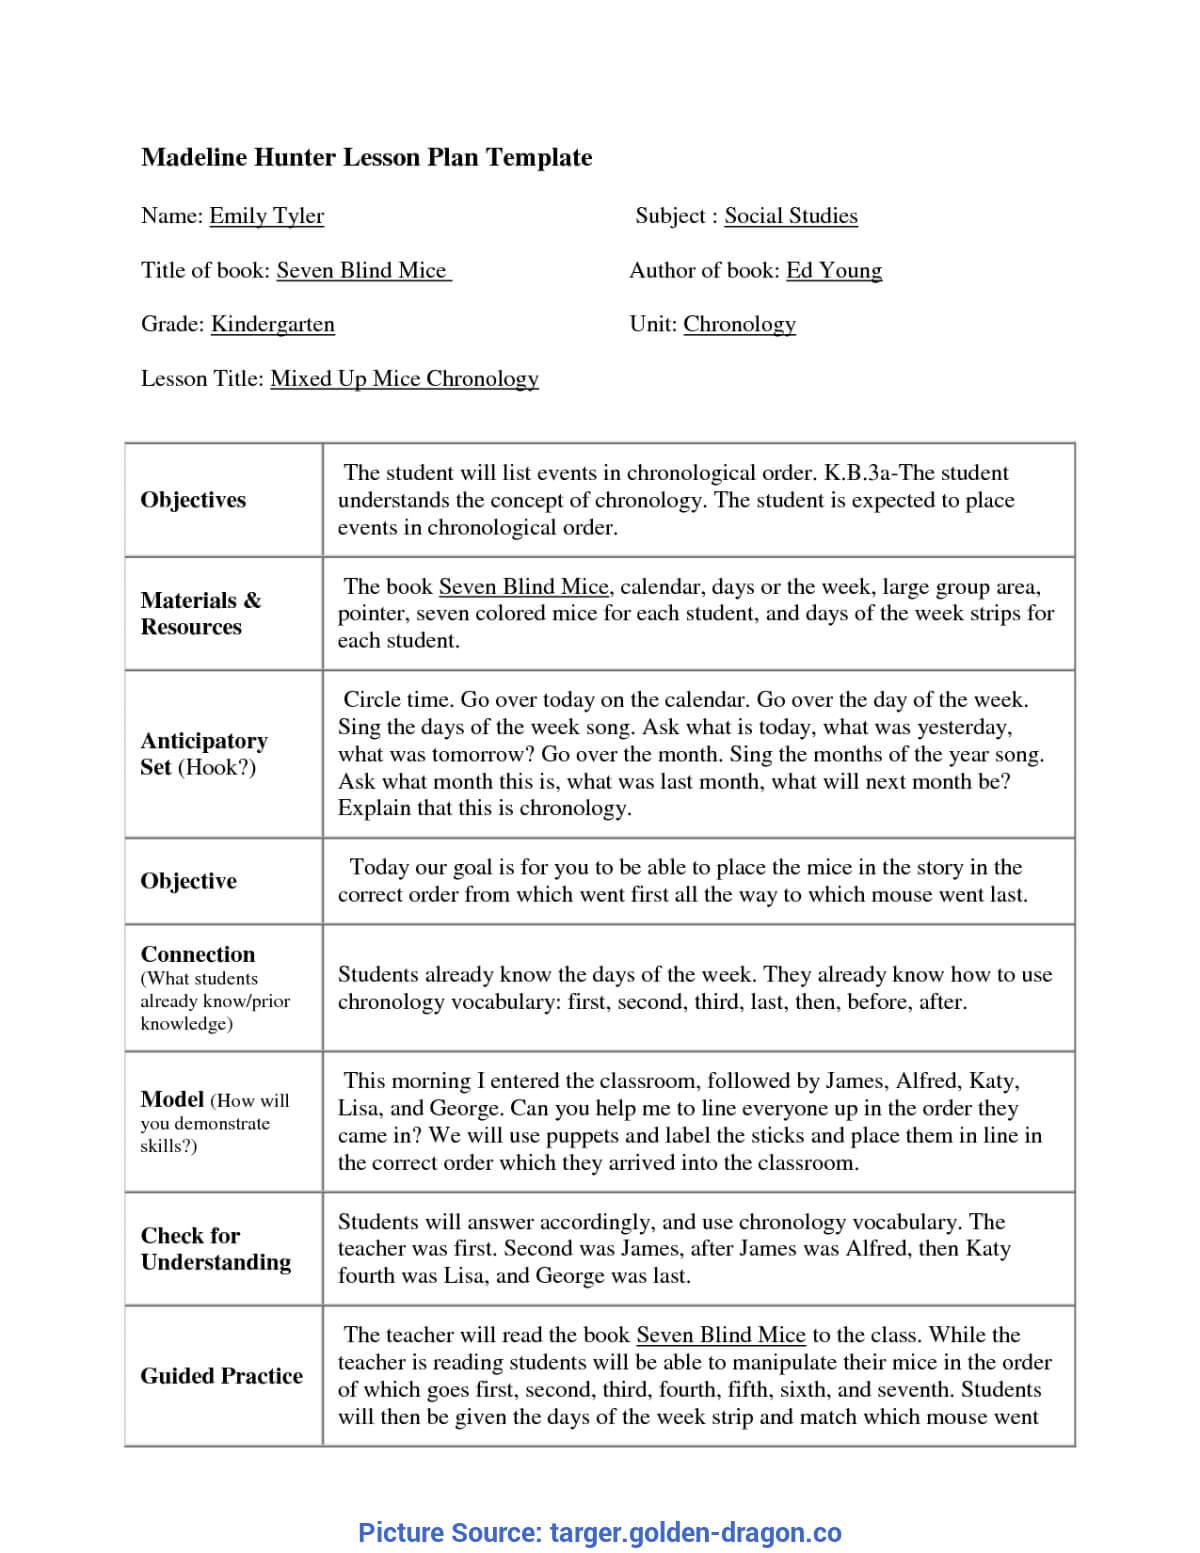 Top Madeline Hunter Lesson Plan Kindergarten Madeline Hunter within Madeline Hunter Lesson Plan Template Blank